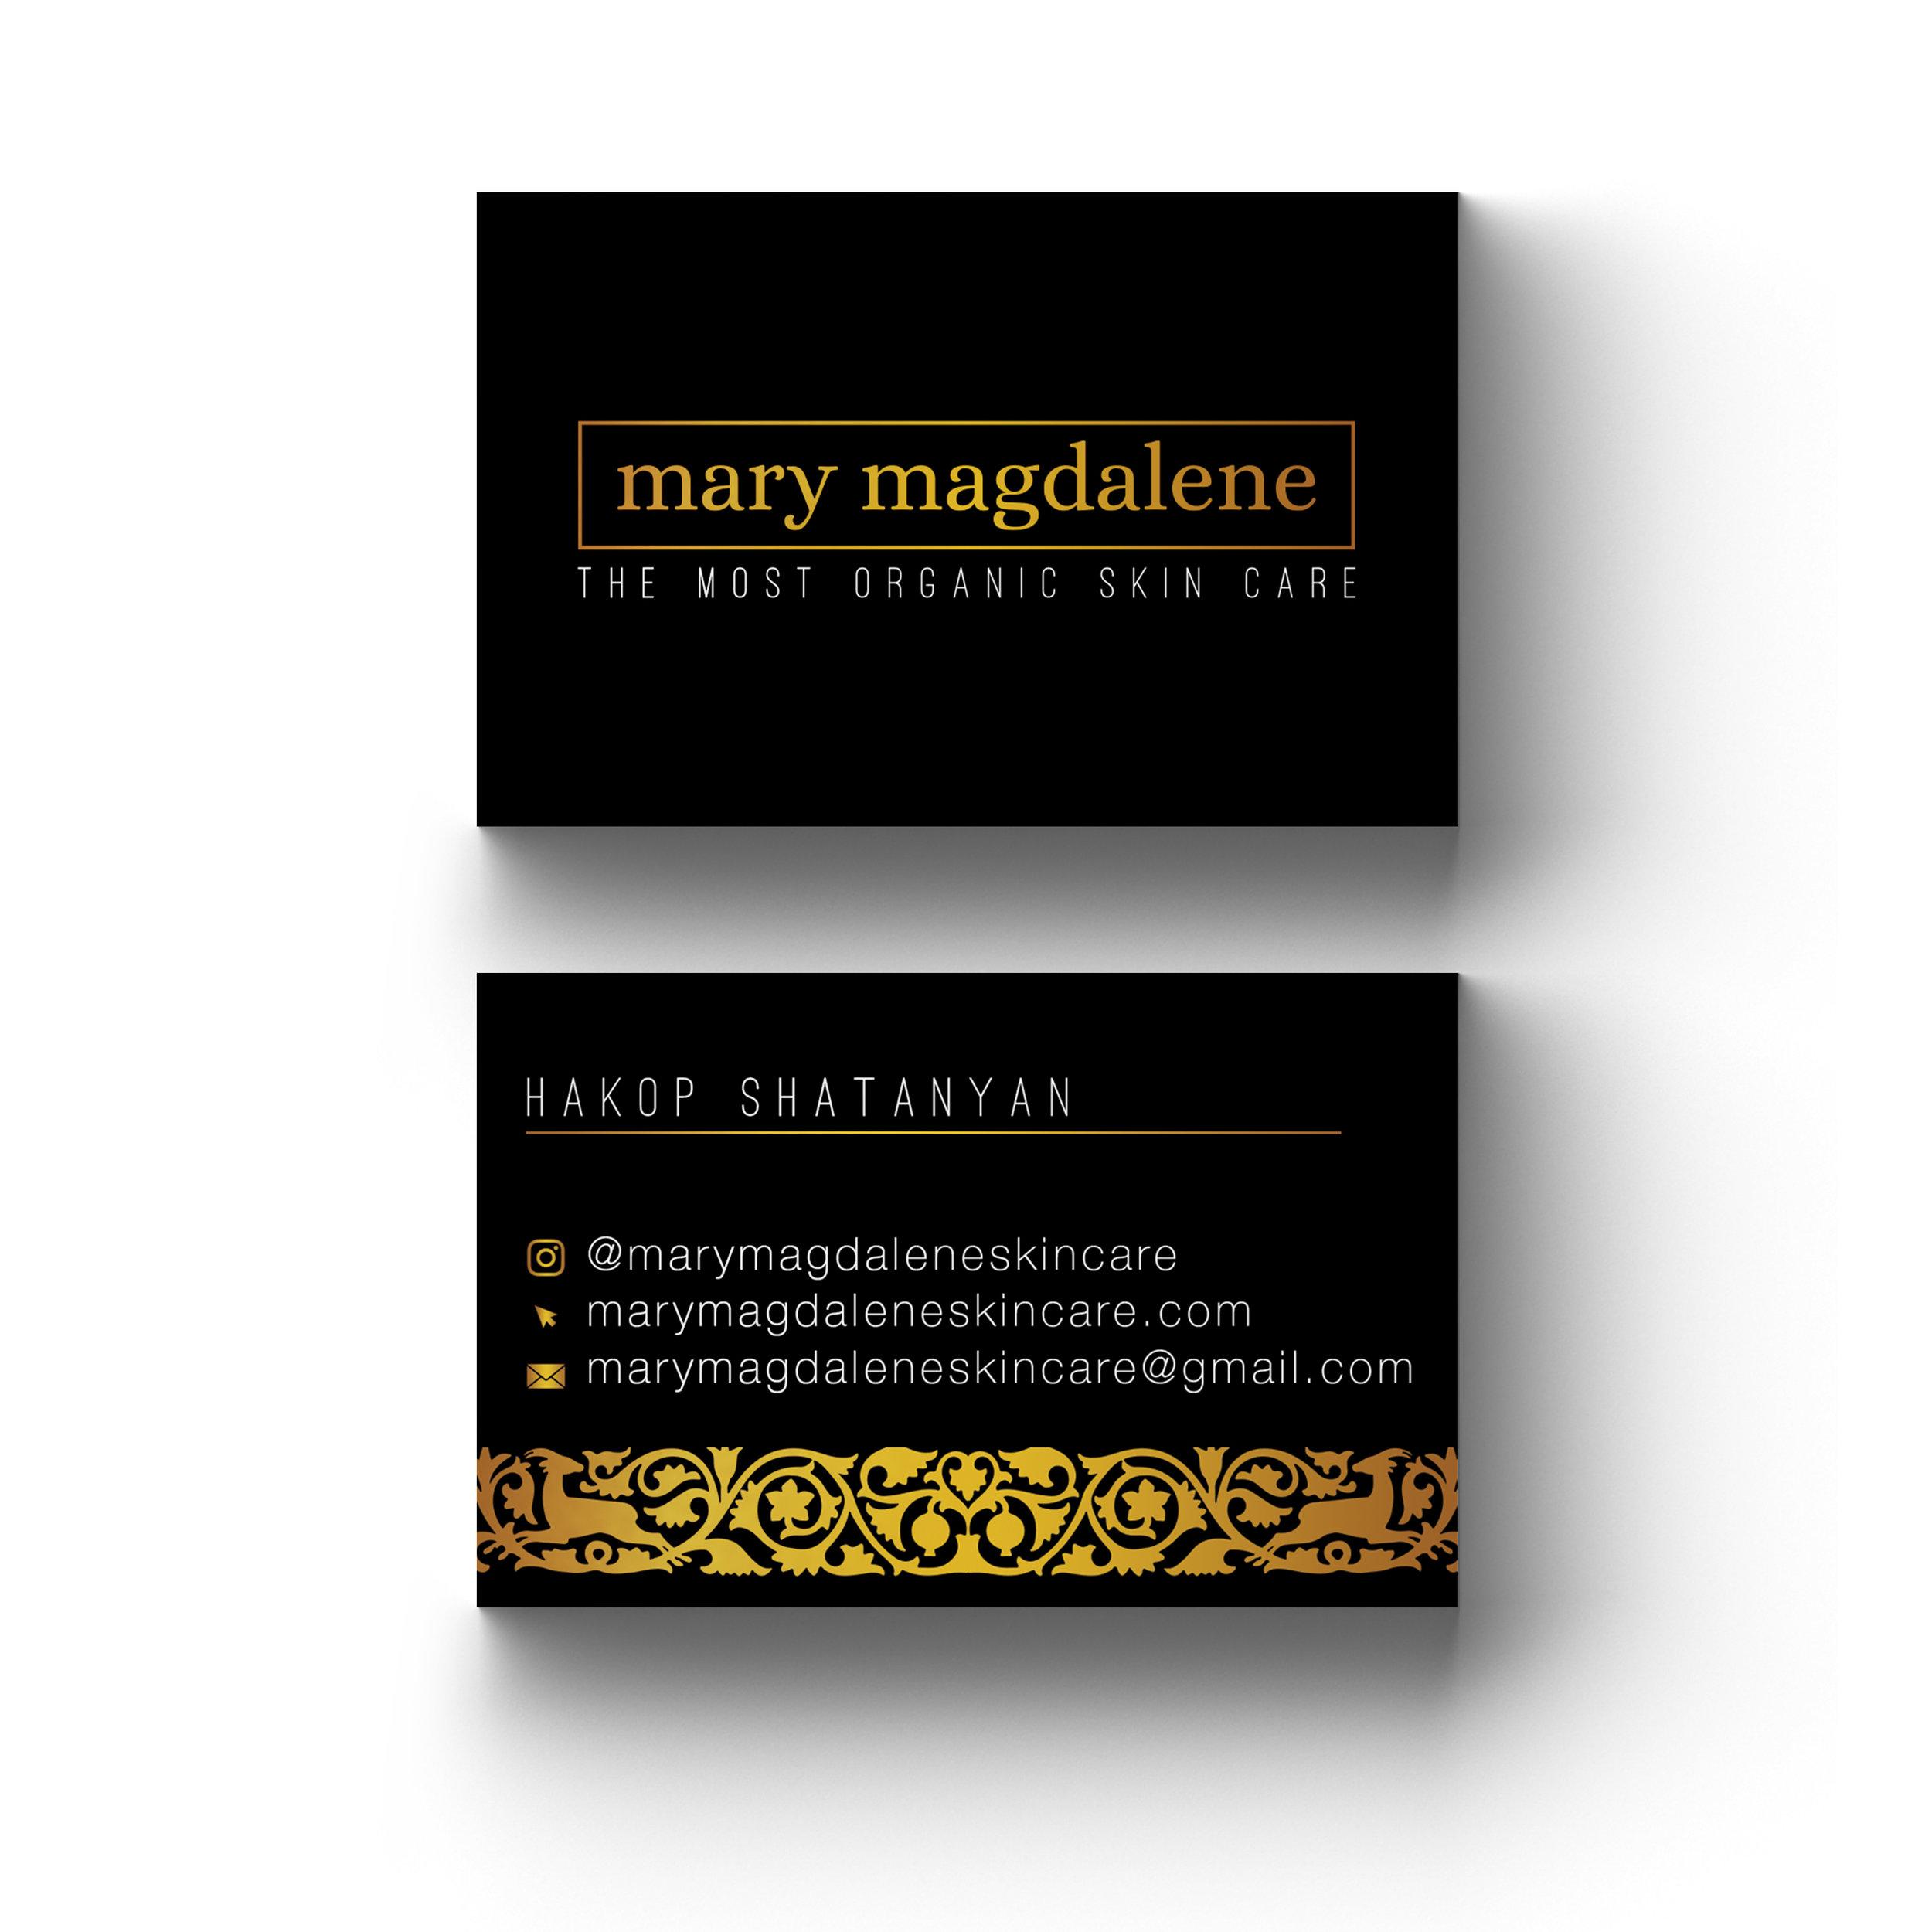 Mary Magdalene Skincare Business Cards (1)